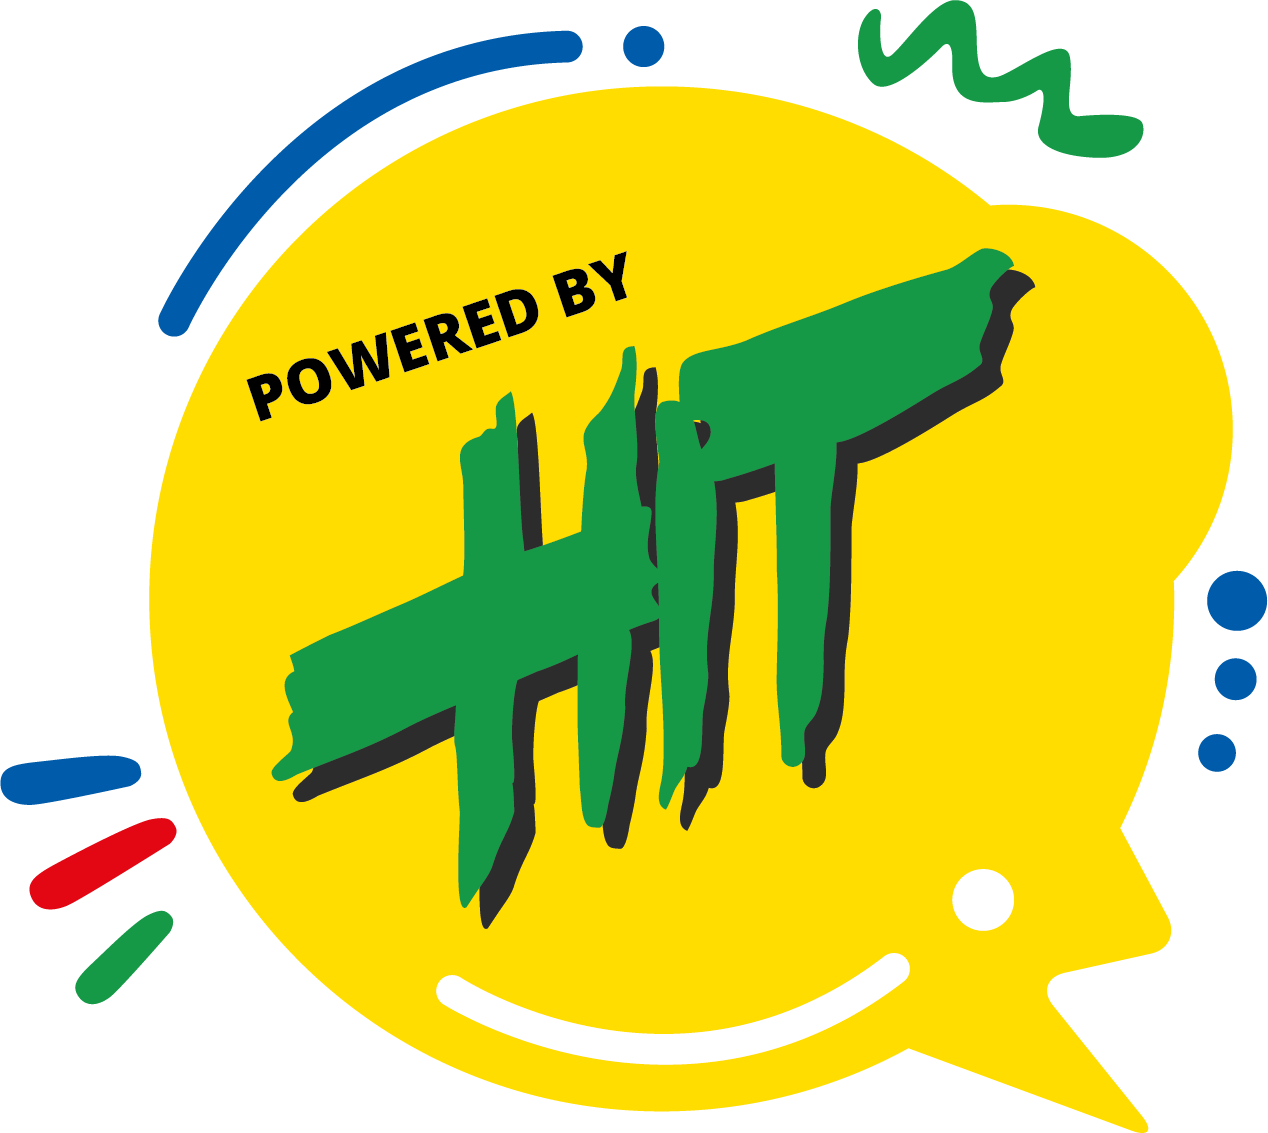 https://thuisopavontuur.nl/images/poweredbyHIT.png